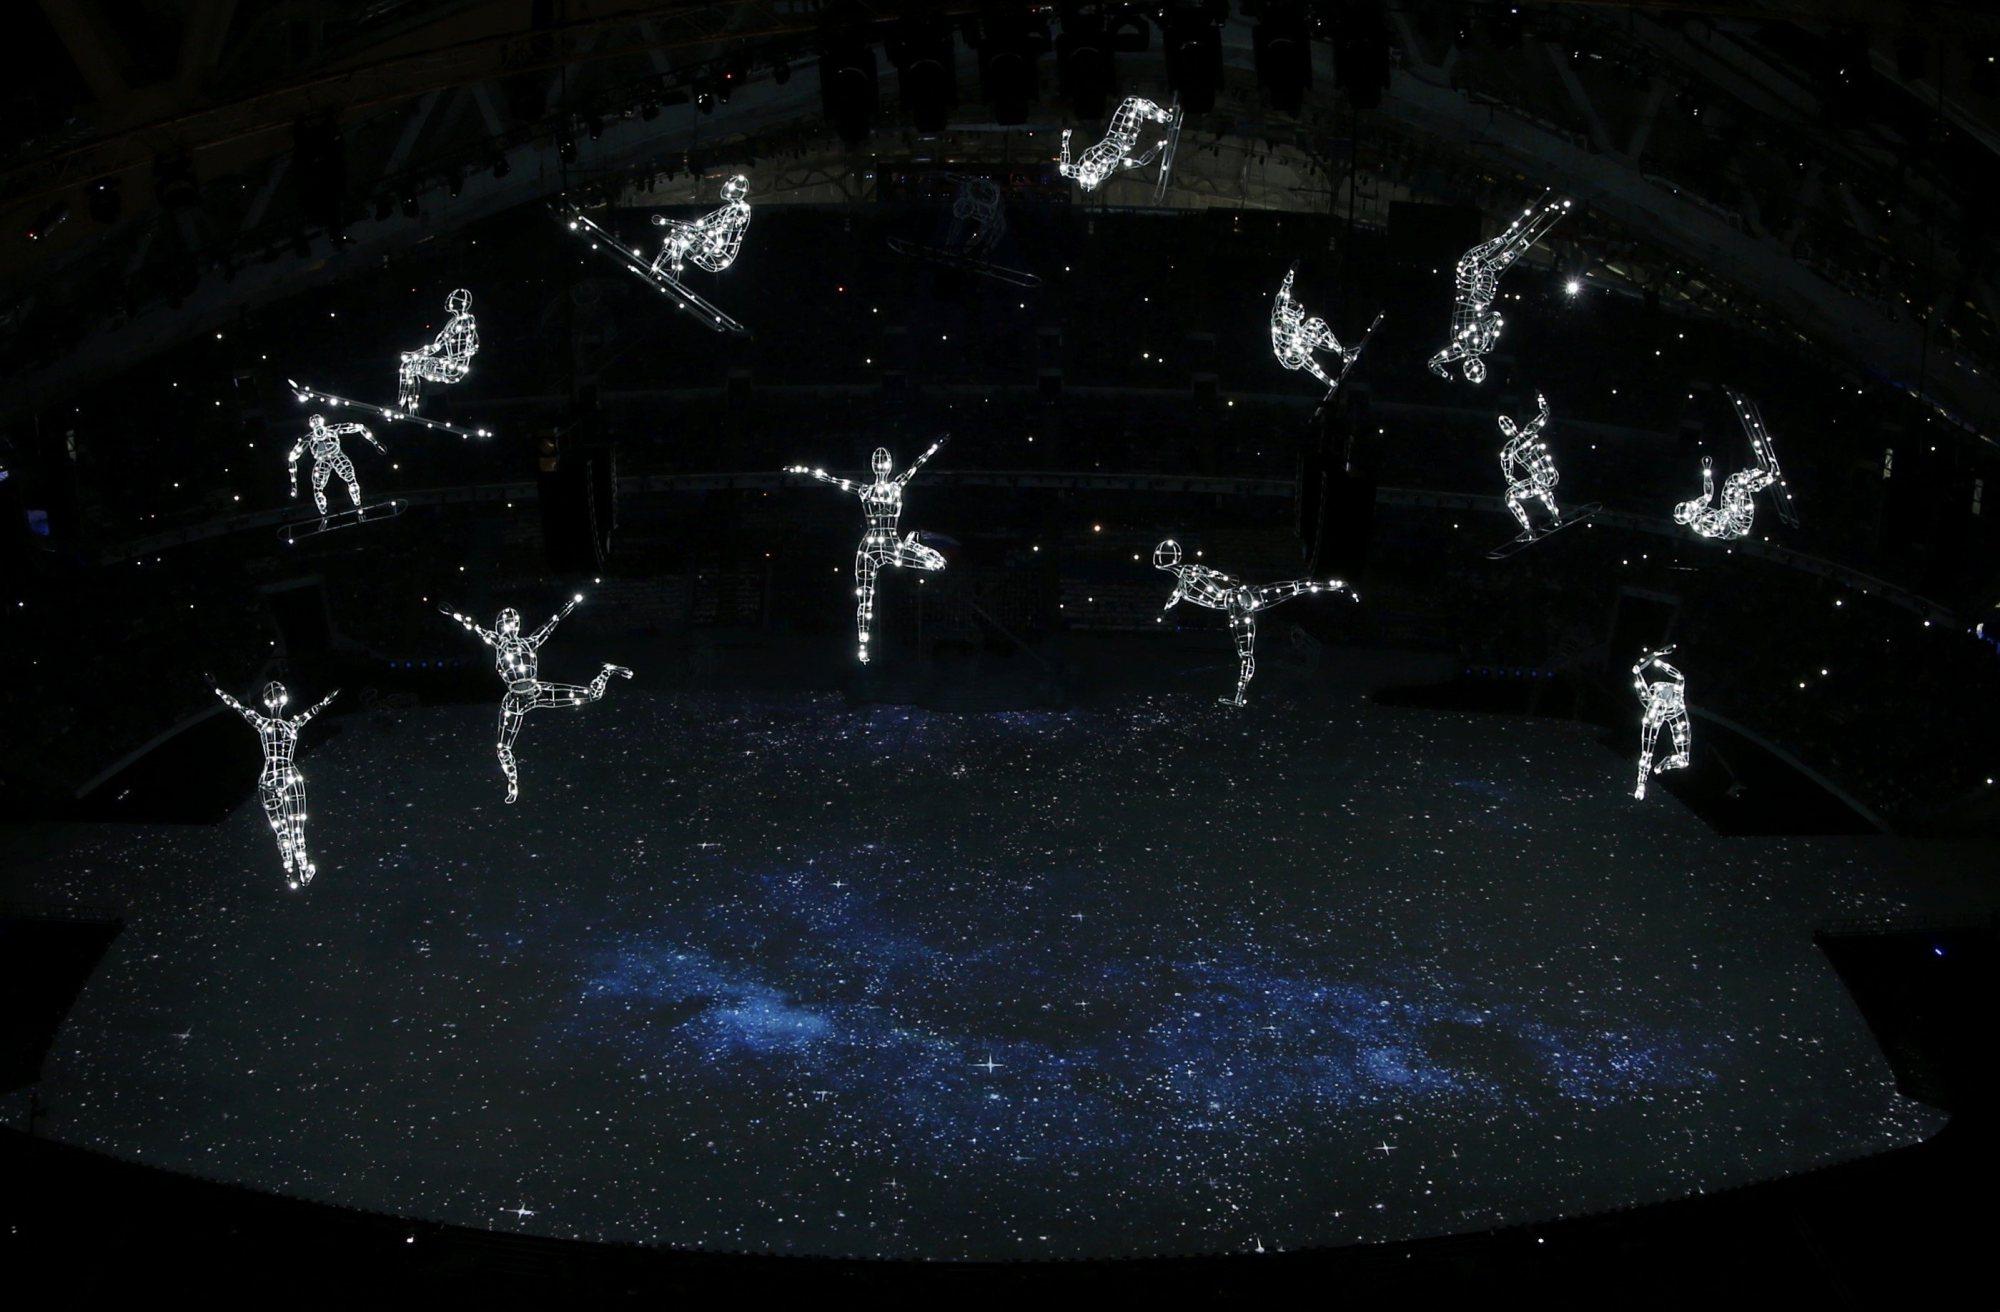 Suspended figures representing different winter sports illuminate.